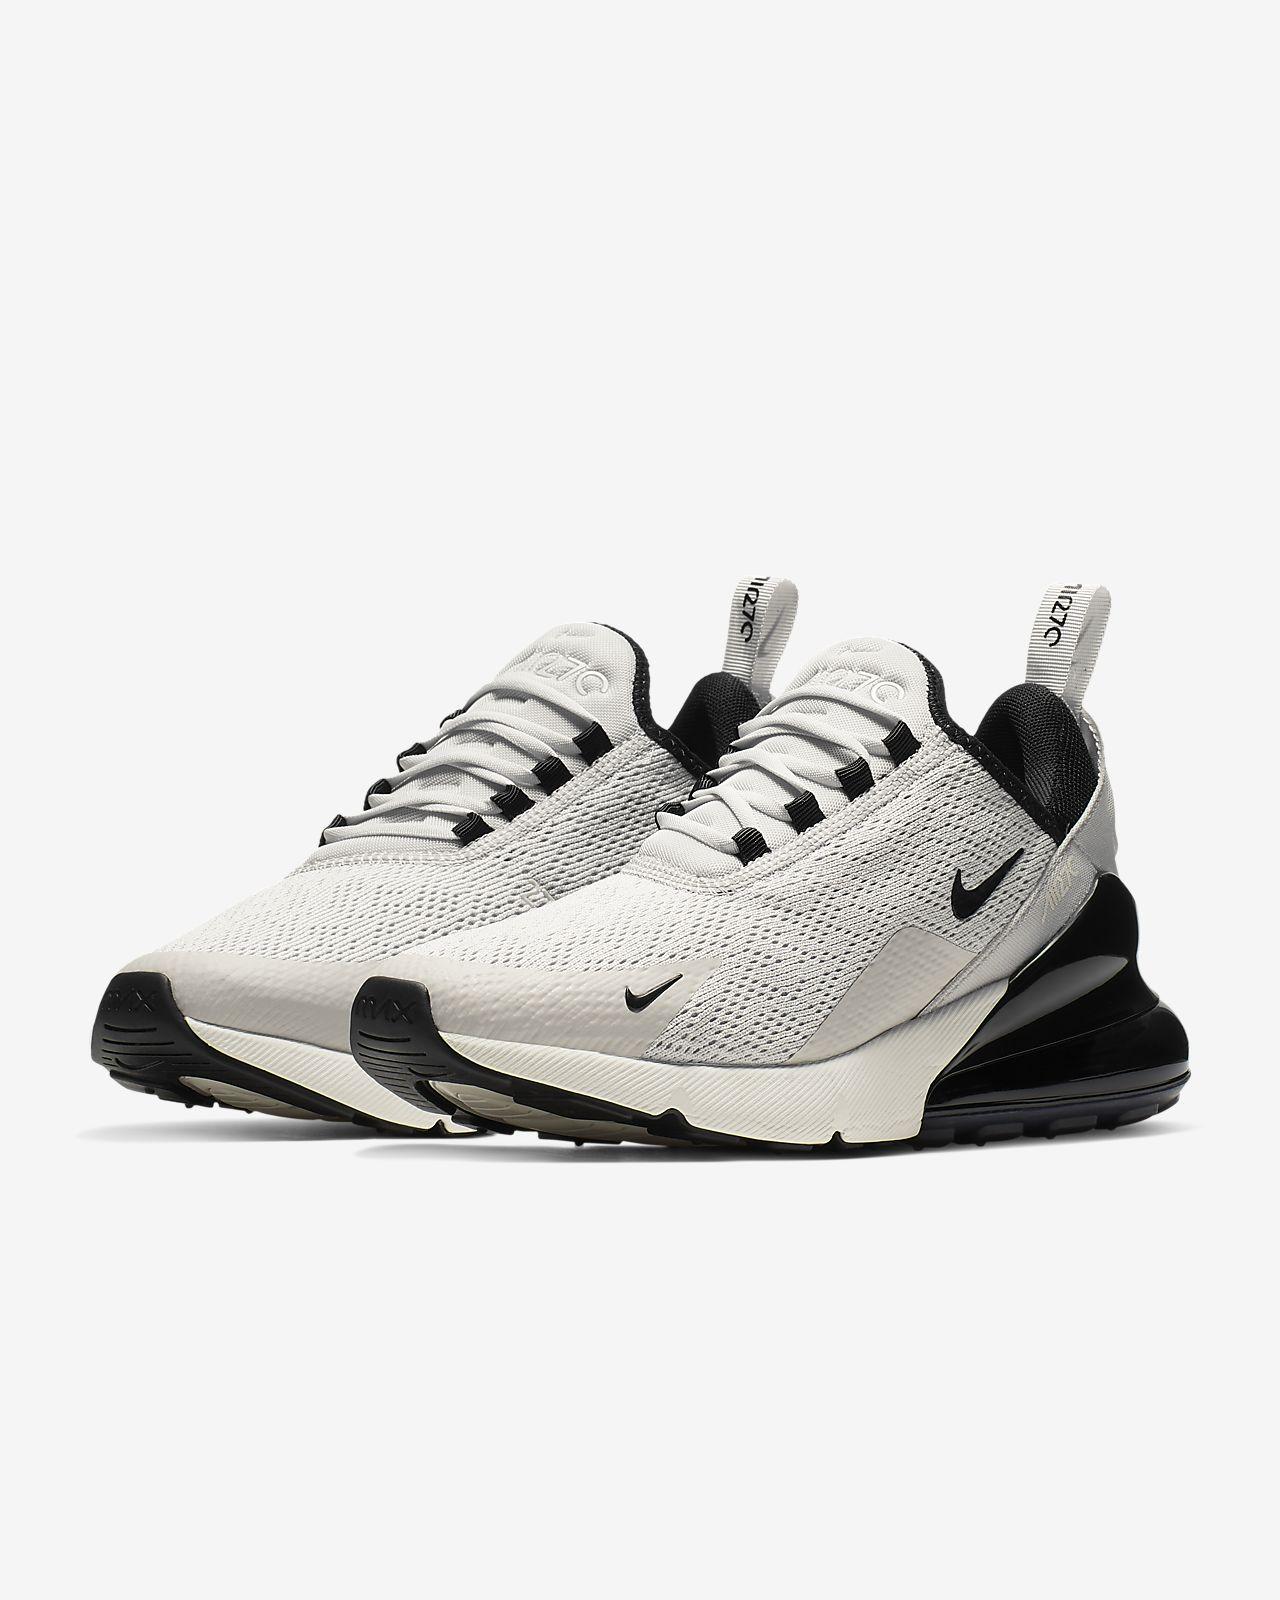 9bce34eb18e Γυναικείο παπούτσι Nike Air Max 270. Nike.com GR